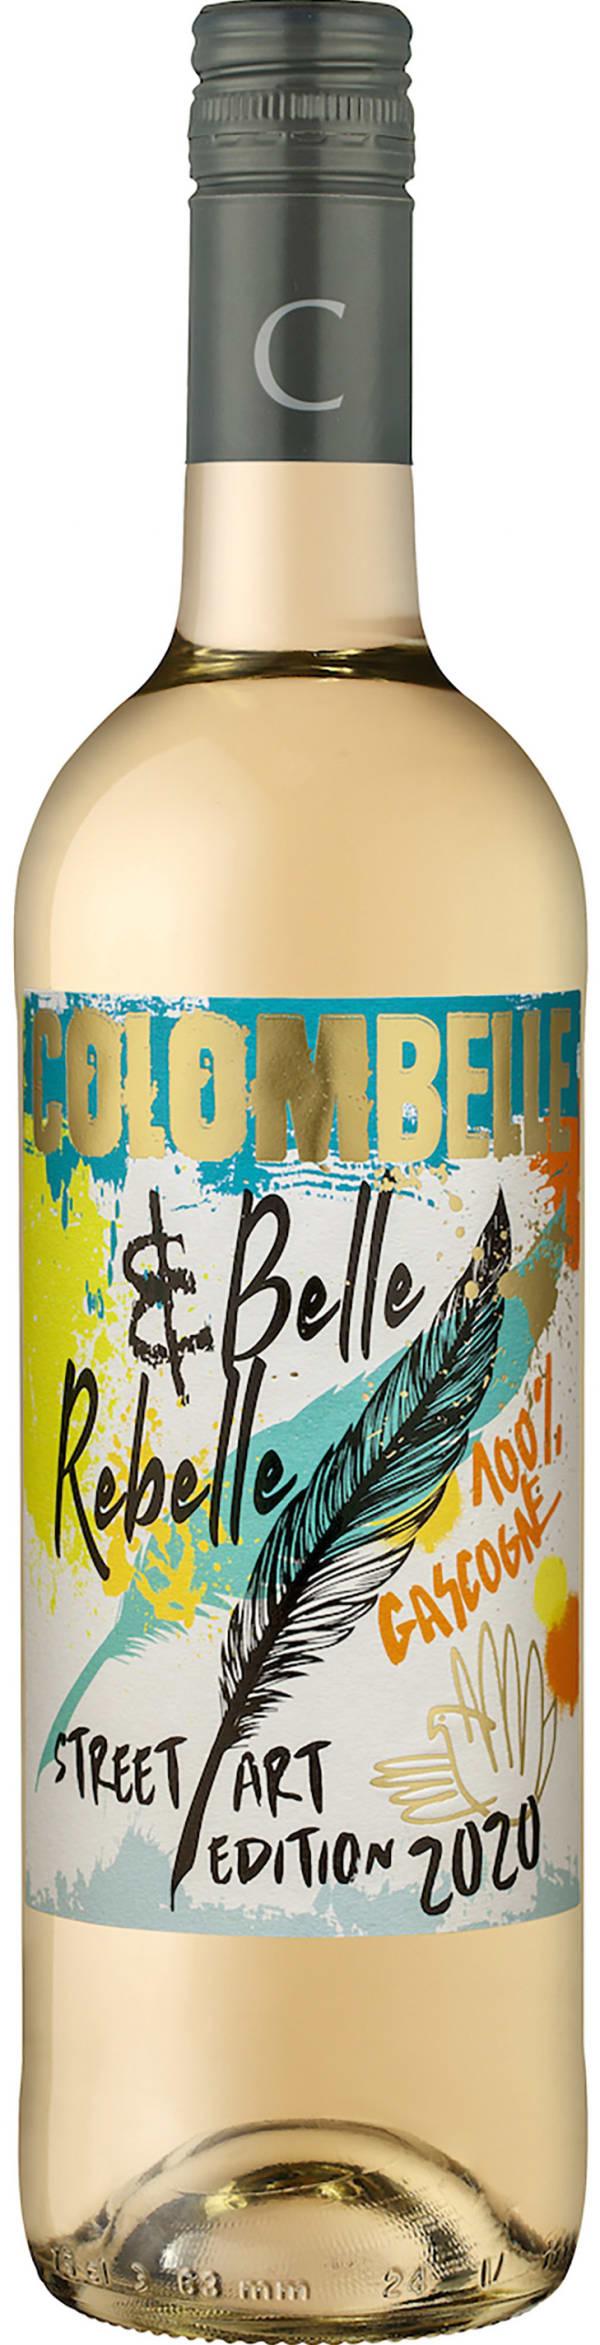 Plaimont Colombelle Belle et Rebelle 2020